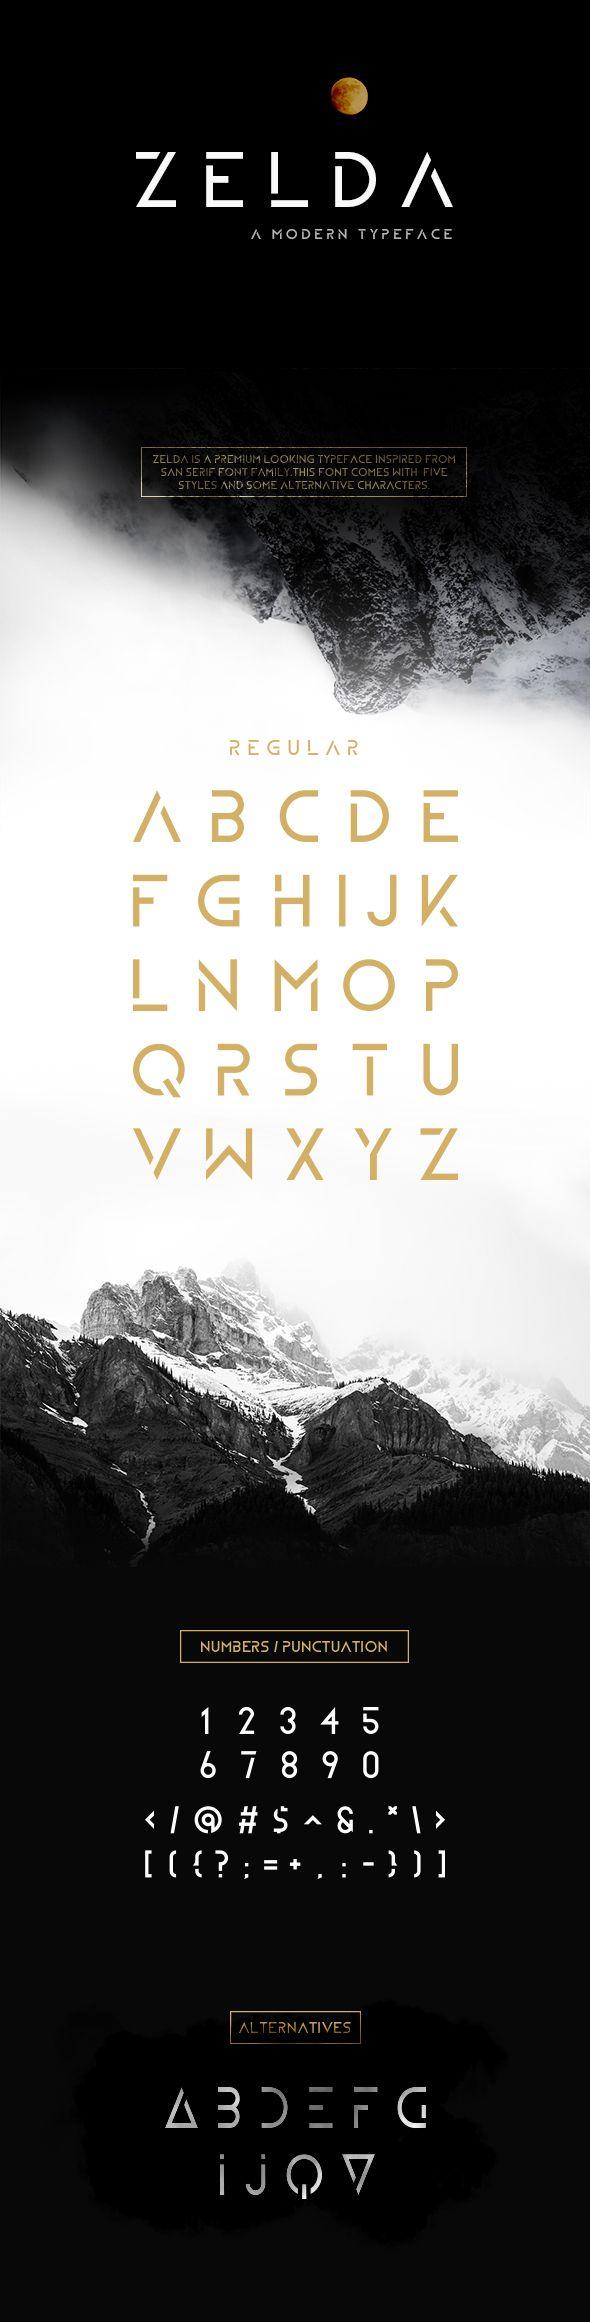 ZELDA Typeface (REGULAR)  #serif #font #sans • Click here to download ! http://graphicriver.net/item/zelda-typeface-regular/16106957?ref=pxcr